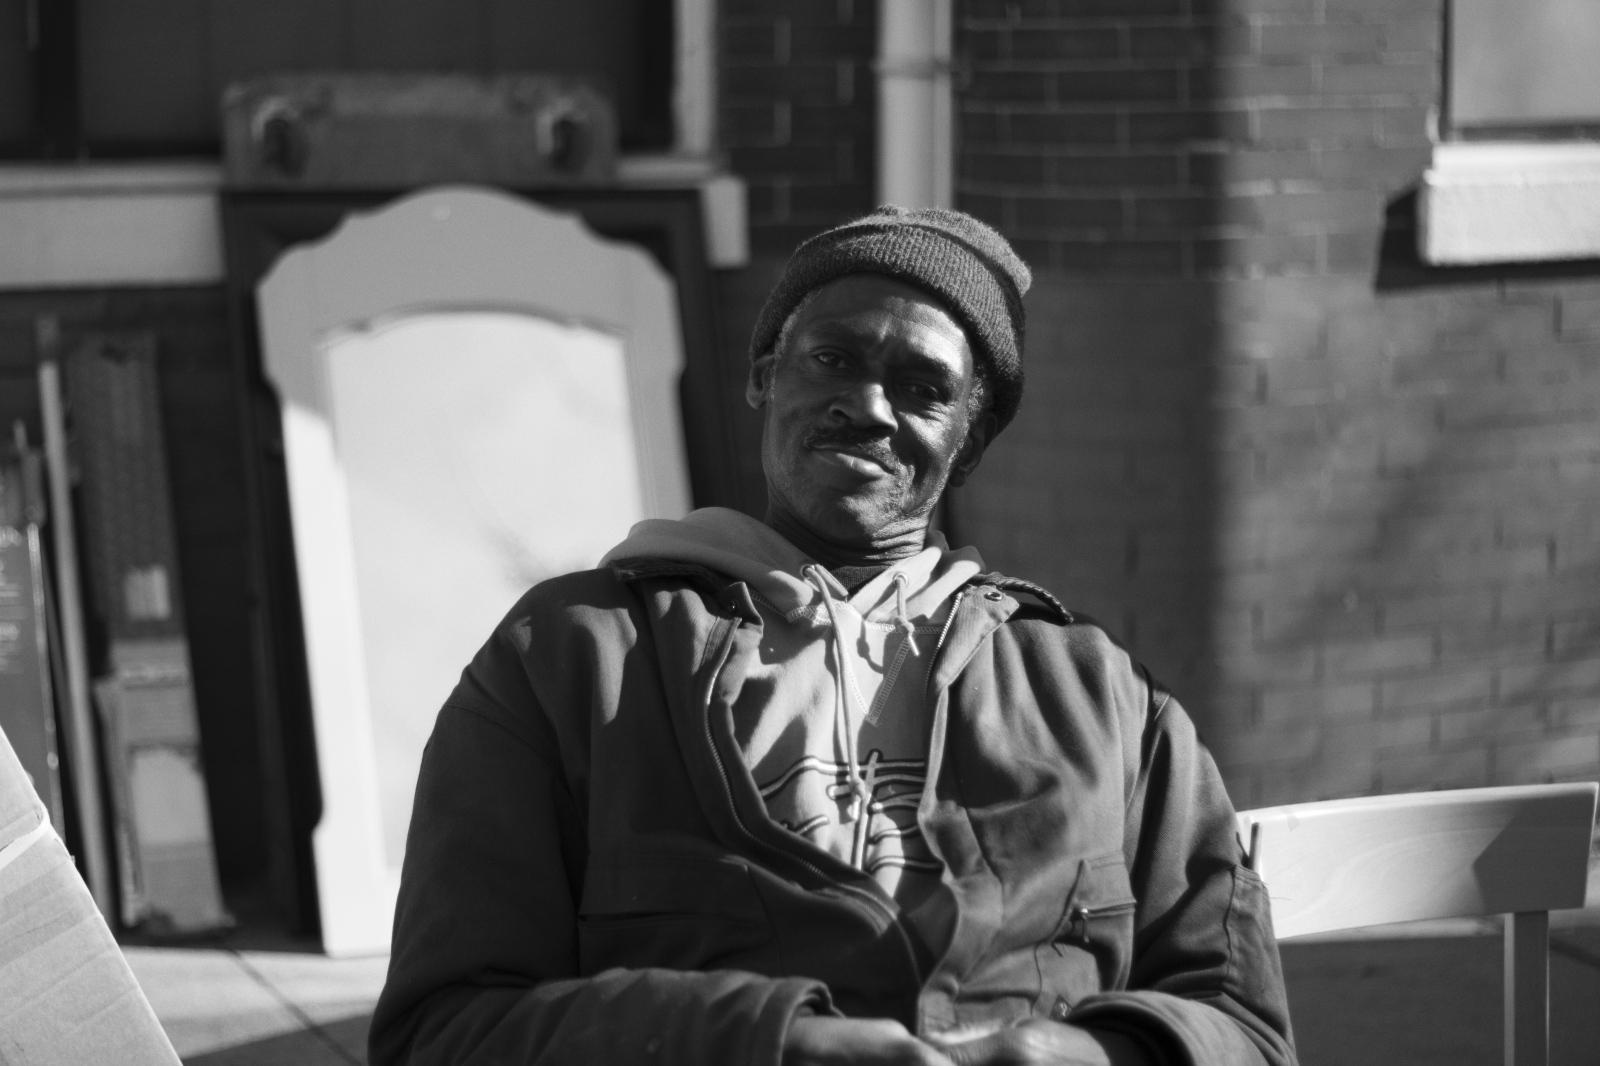 an elderly black man sitting in a chair outside